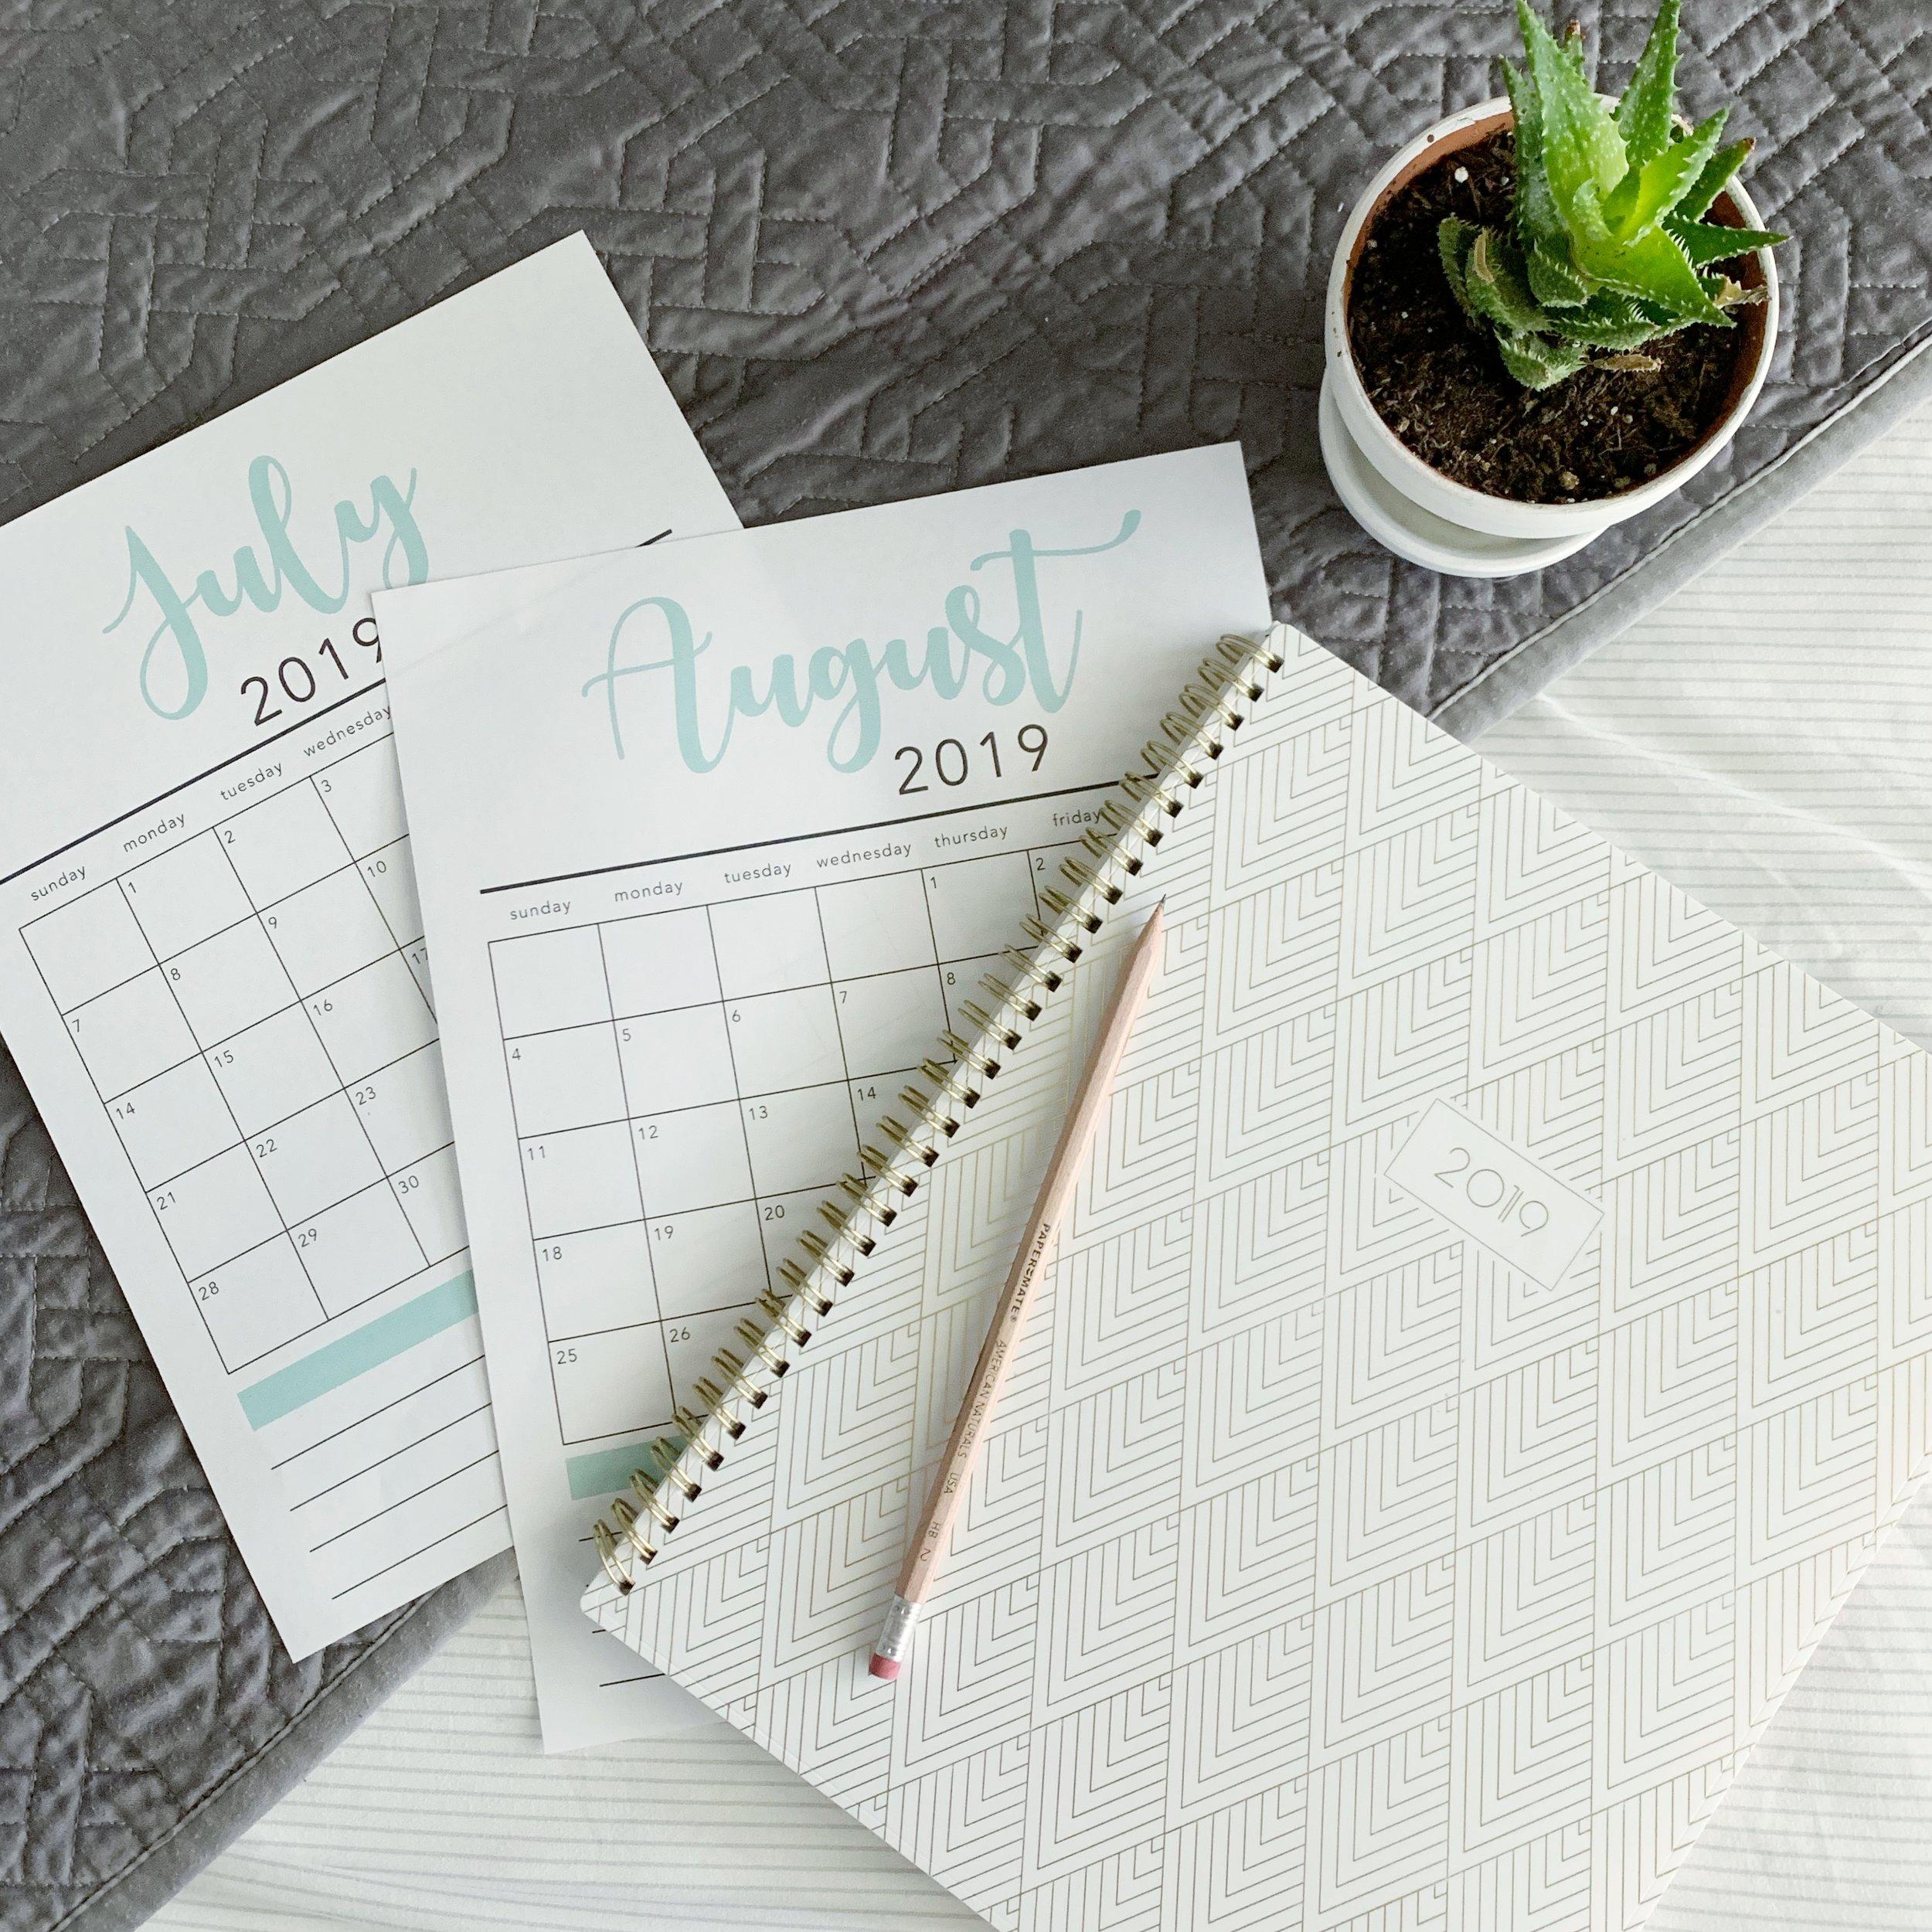 content calendars for Instagram